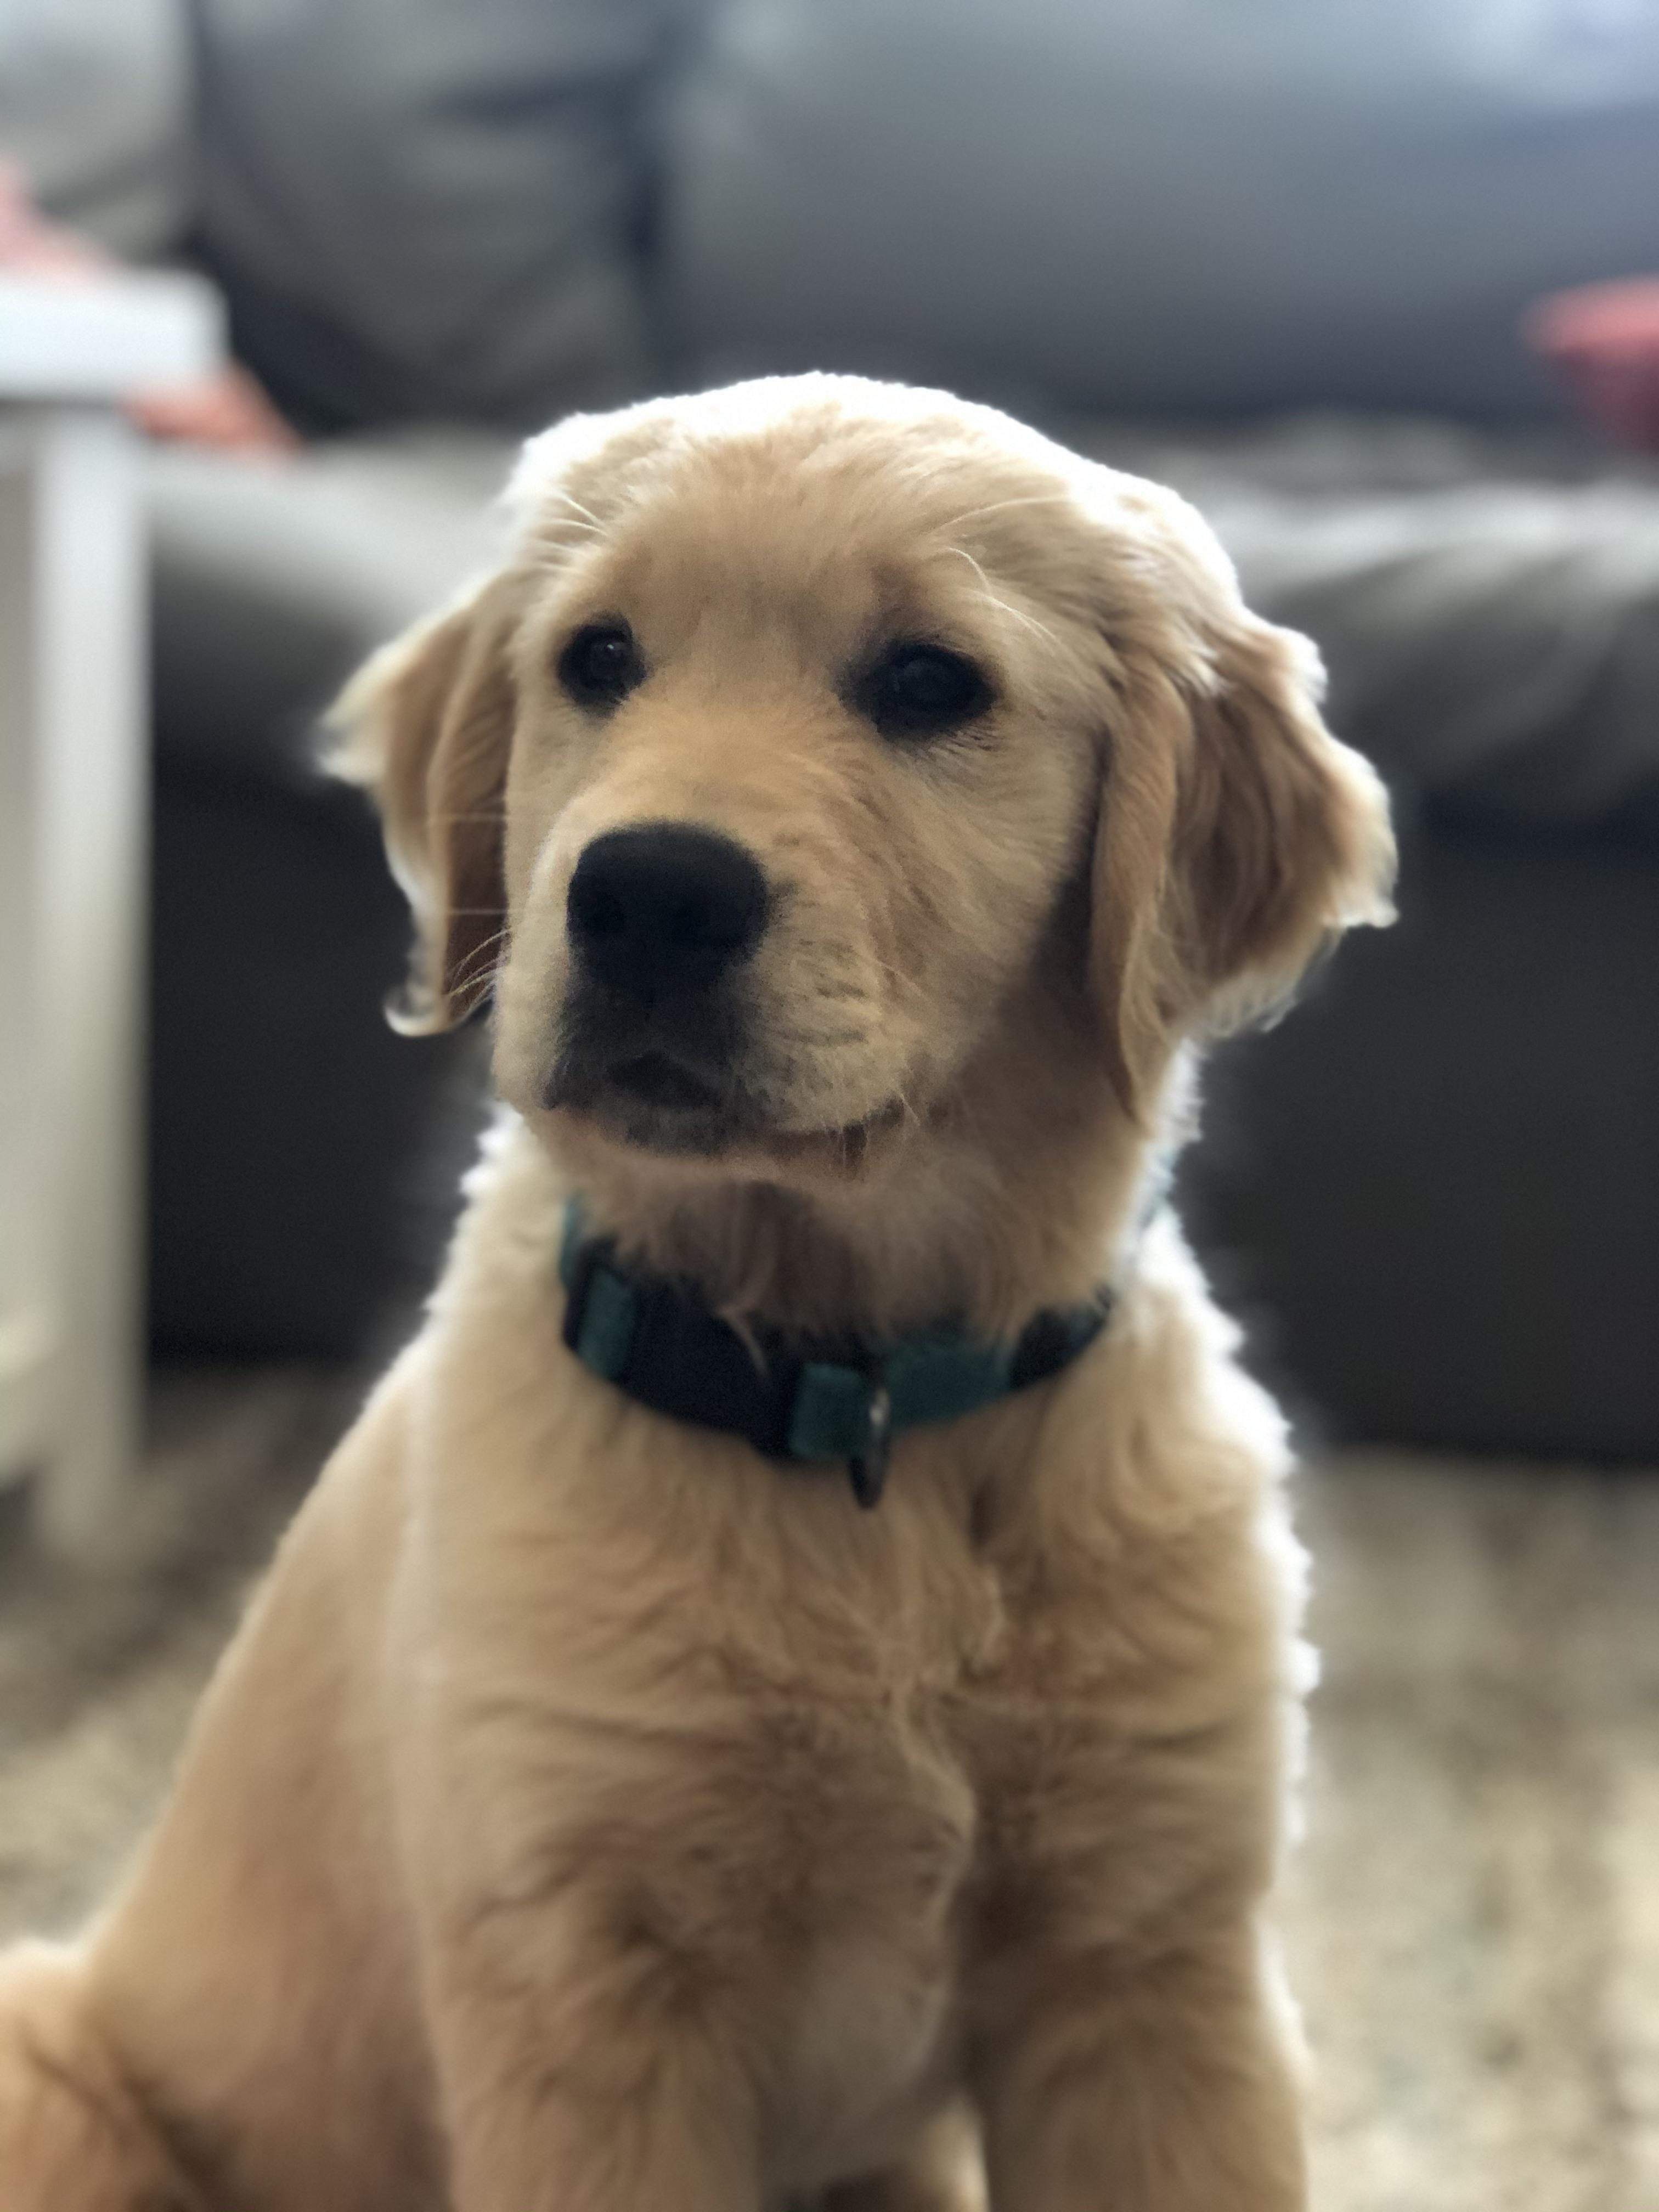 He S Growing So Fast Super Cute Goldenretriever 3 In 2020 Golden Retriever Golden Retriever Corgi Mix Dogs Golden Retriever